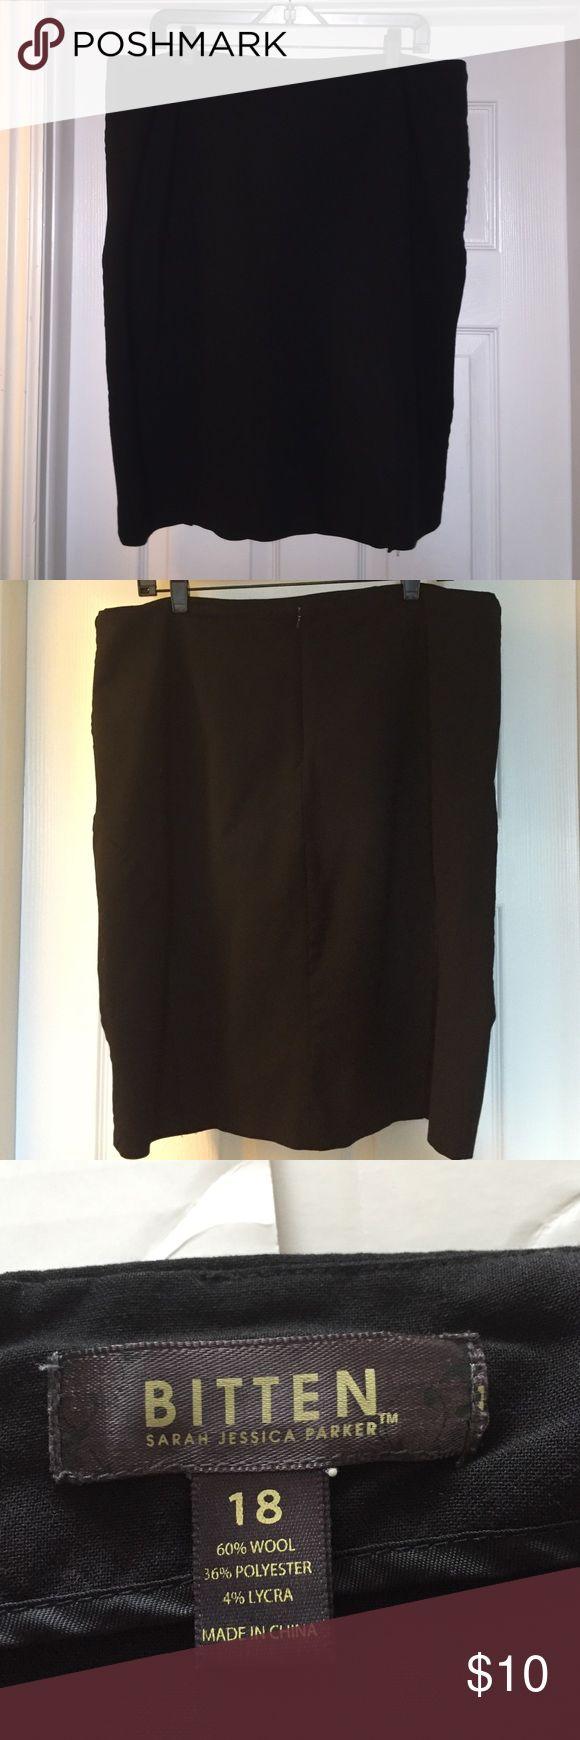 Bitten by Sarah Jessica Parker Pencil skirt Black pencil skirt. Zipper and short slits on the back. Bitten by Sarah Jessica Parker  Skirts Pencil